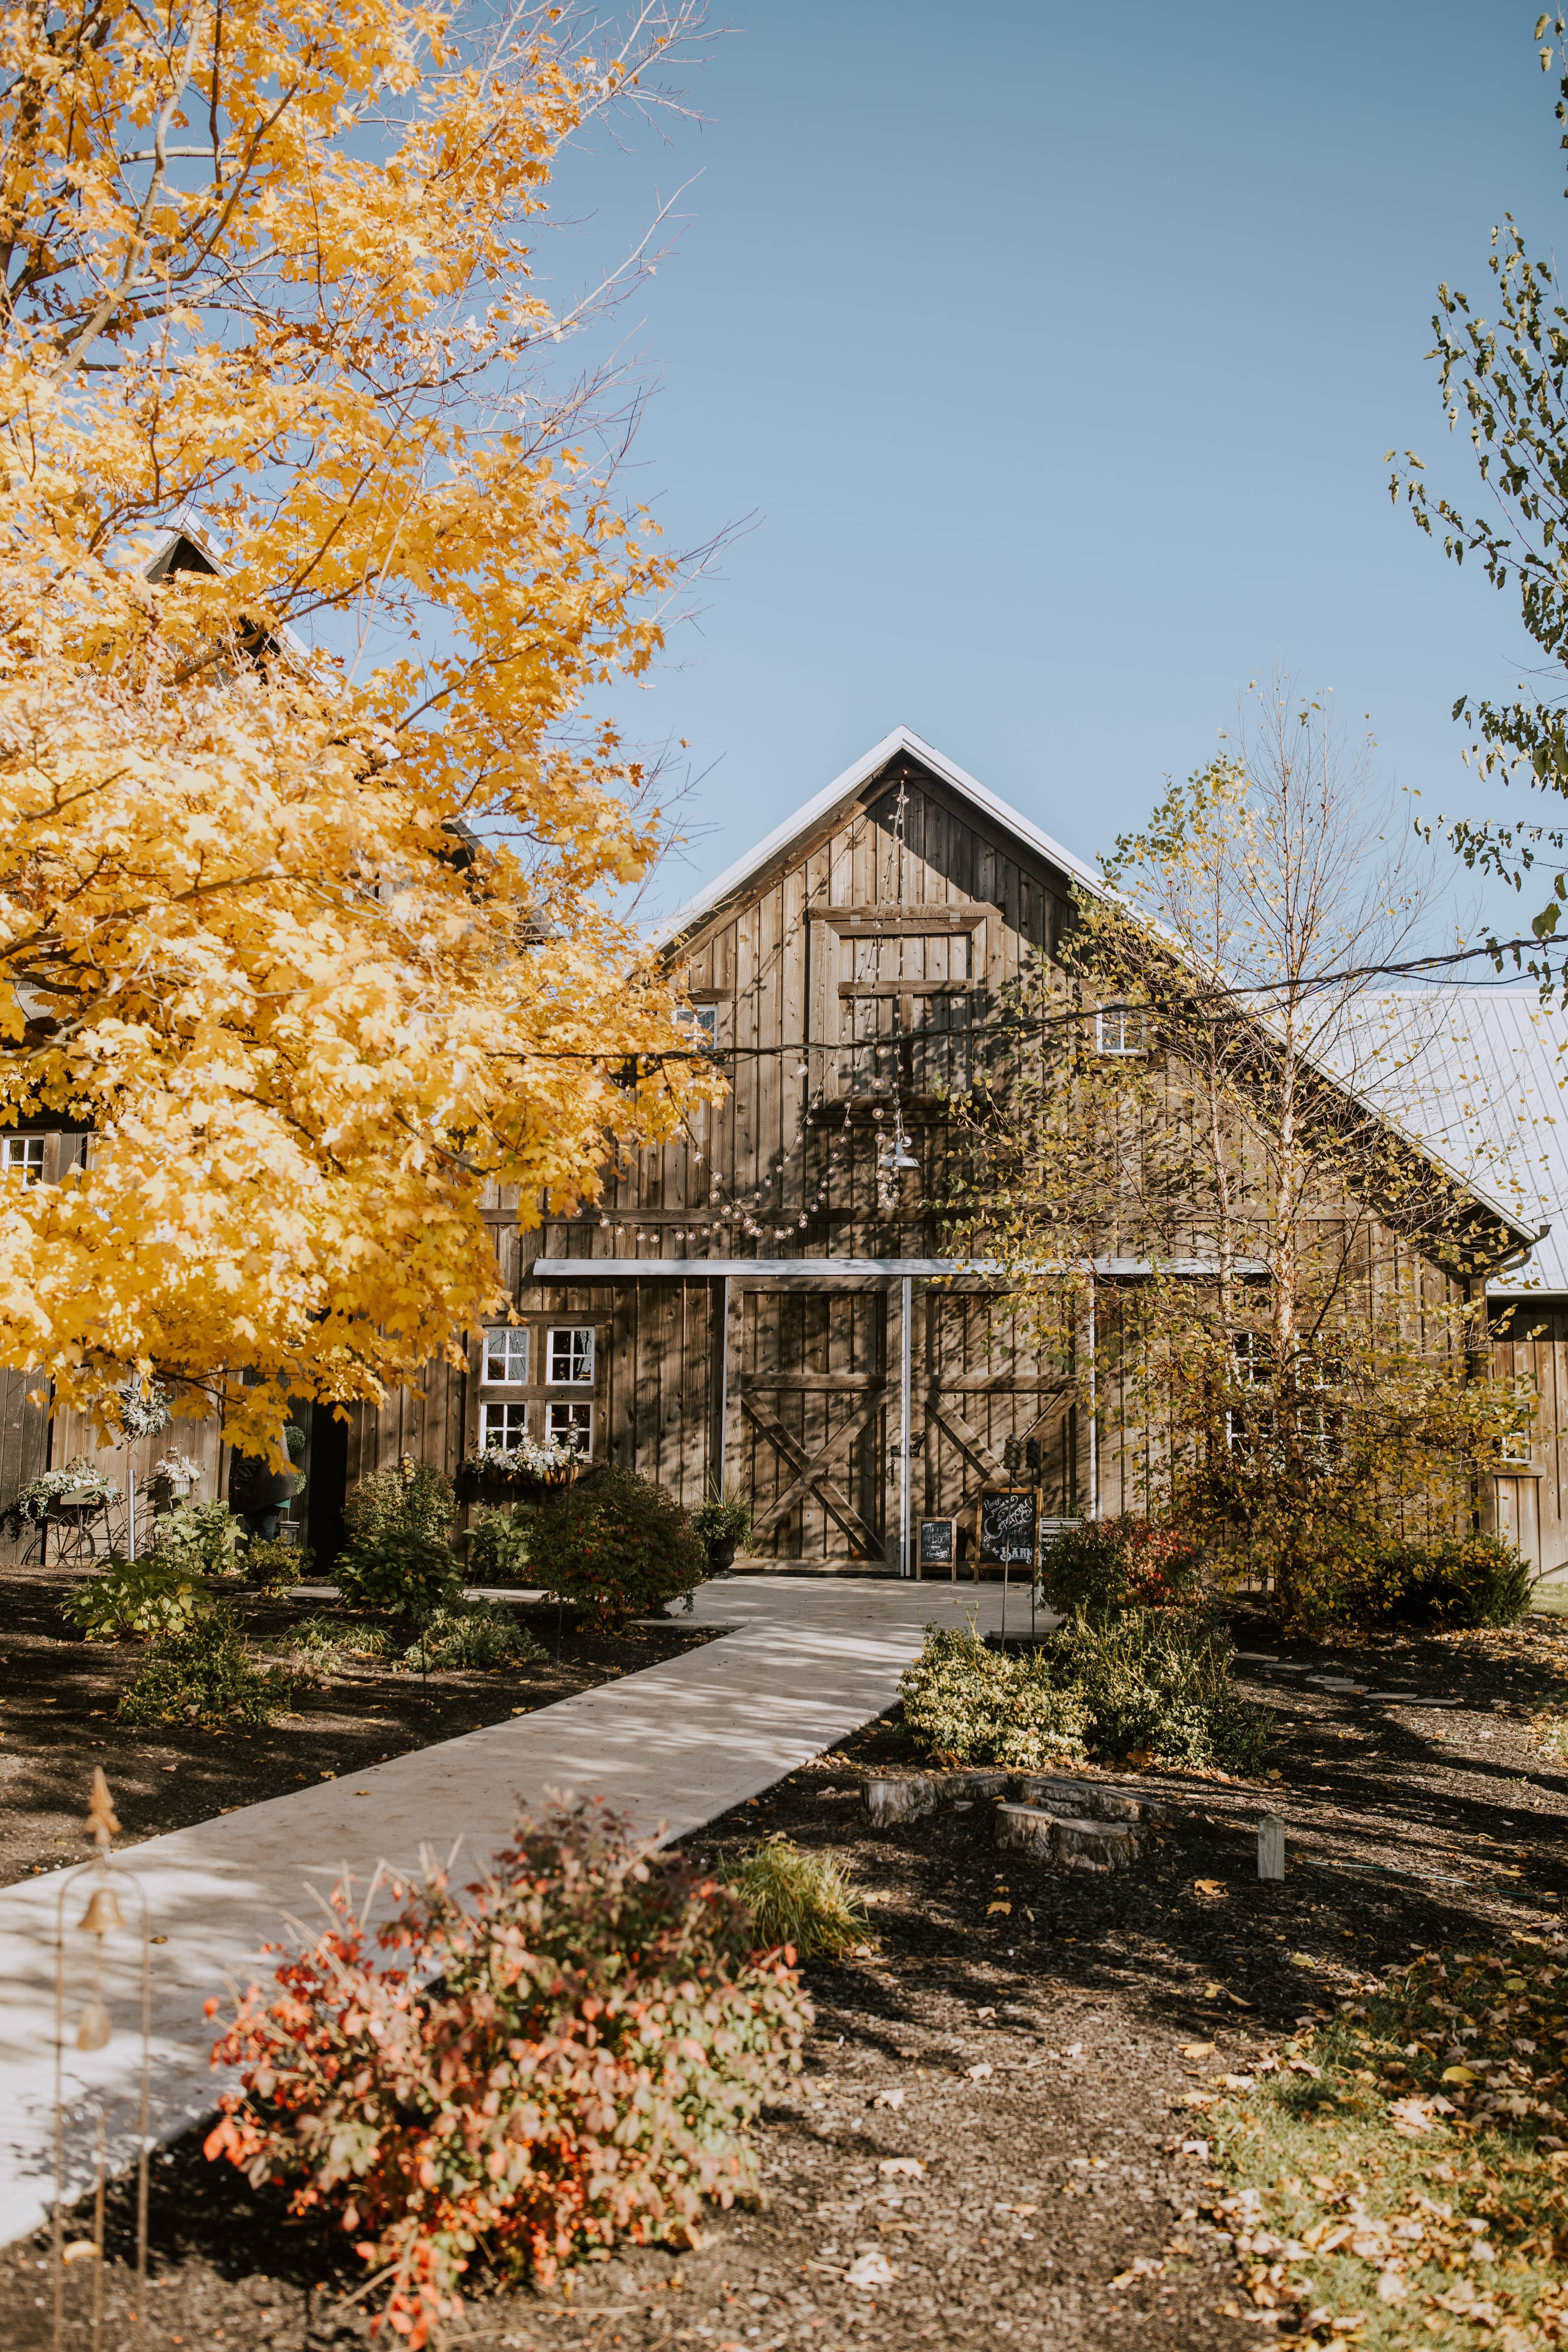 Barn during autumn